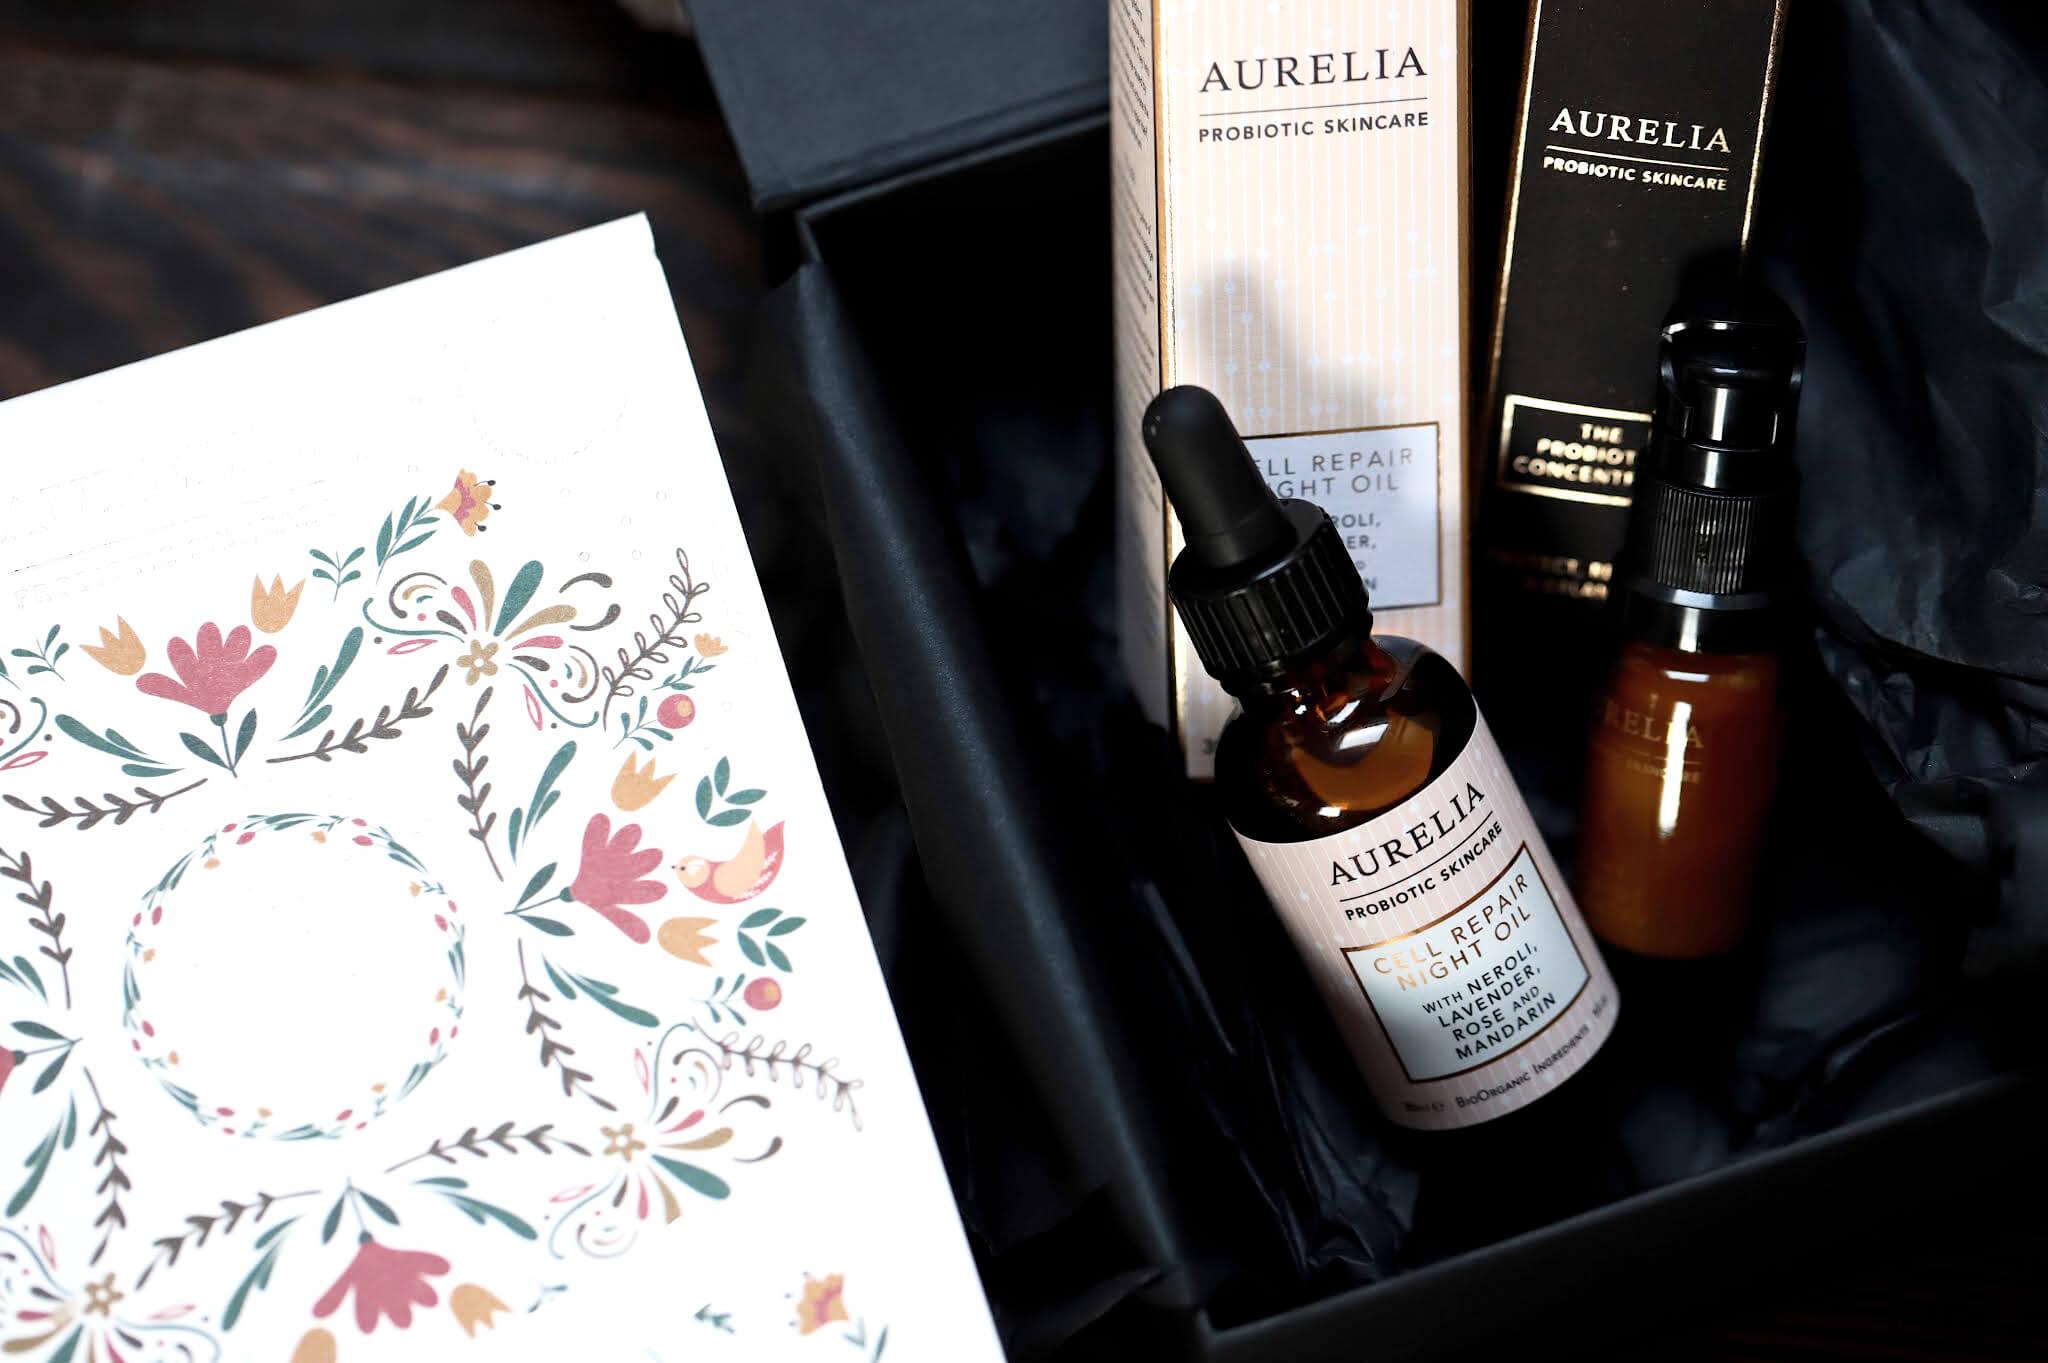 Aurelia Probiotic Coffret de Noël Night Time Repair